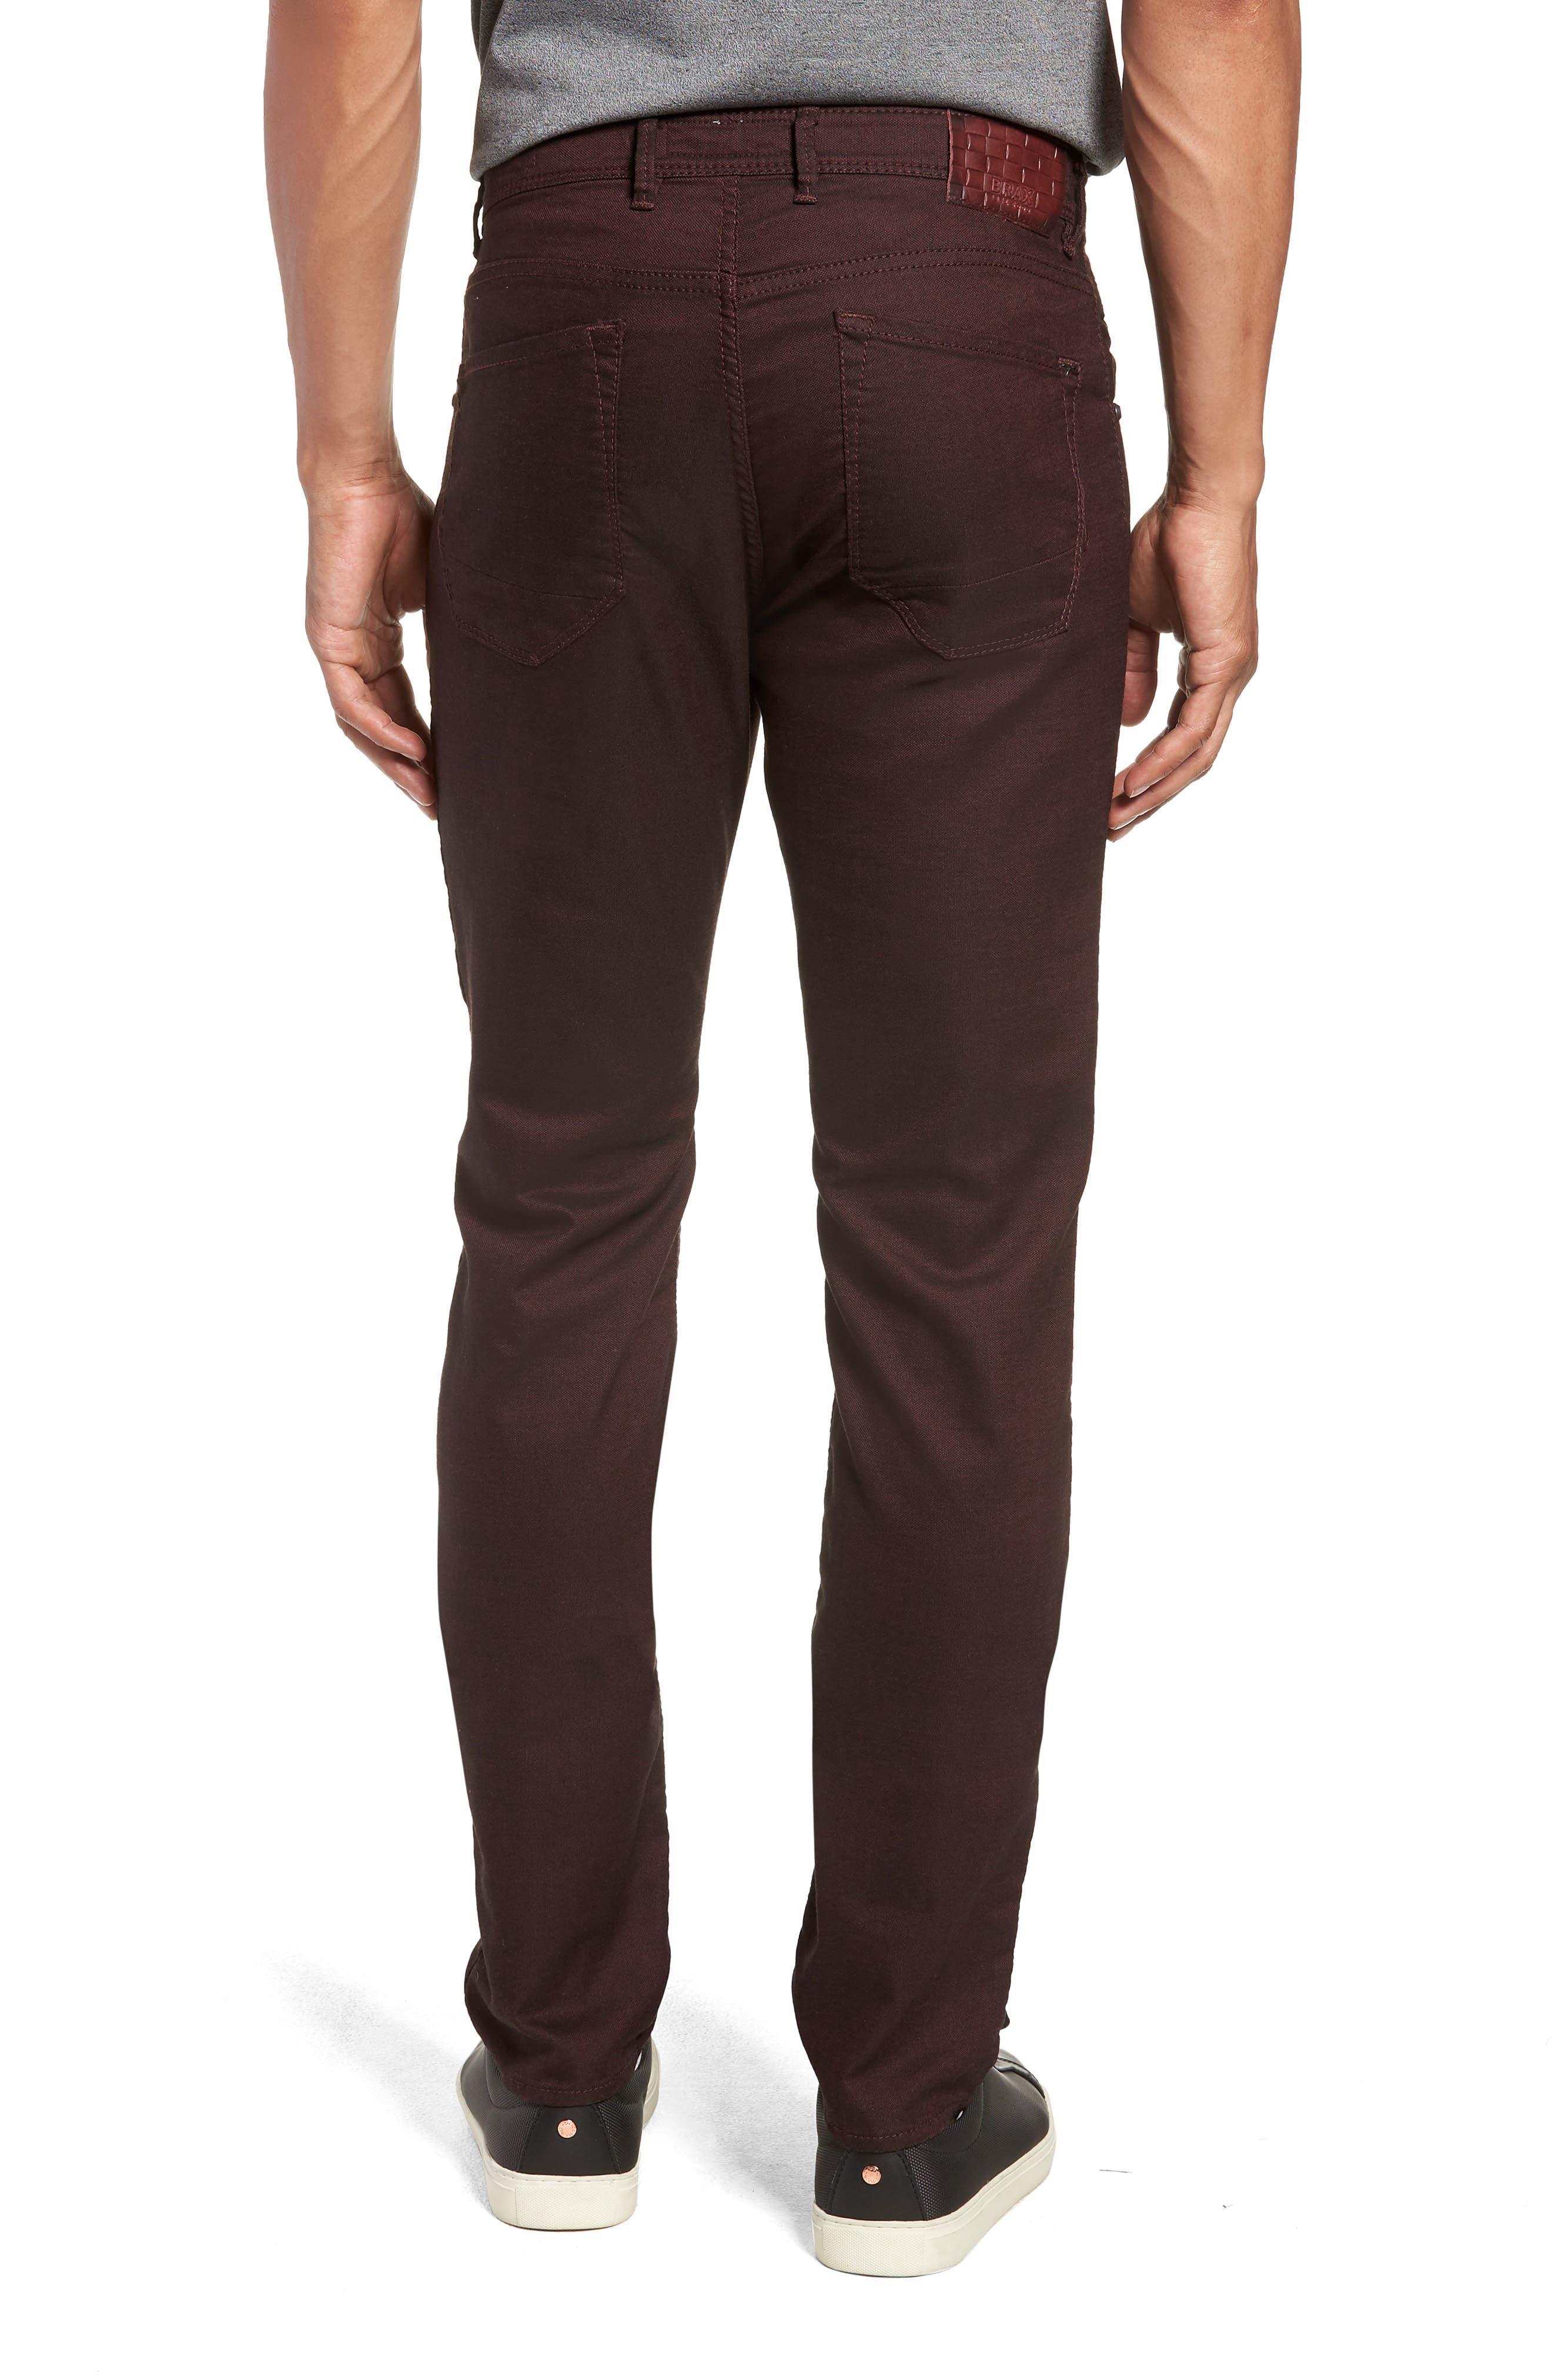 Brax Trousers Pants Nordstrom amp; Men's TBwFndqOT